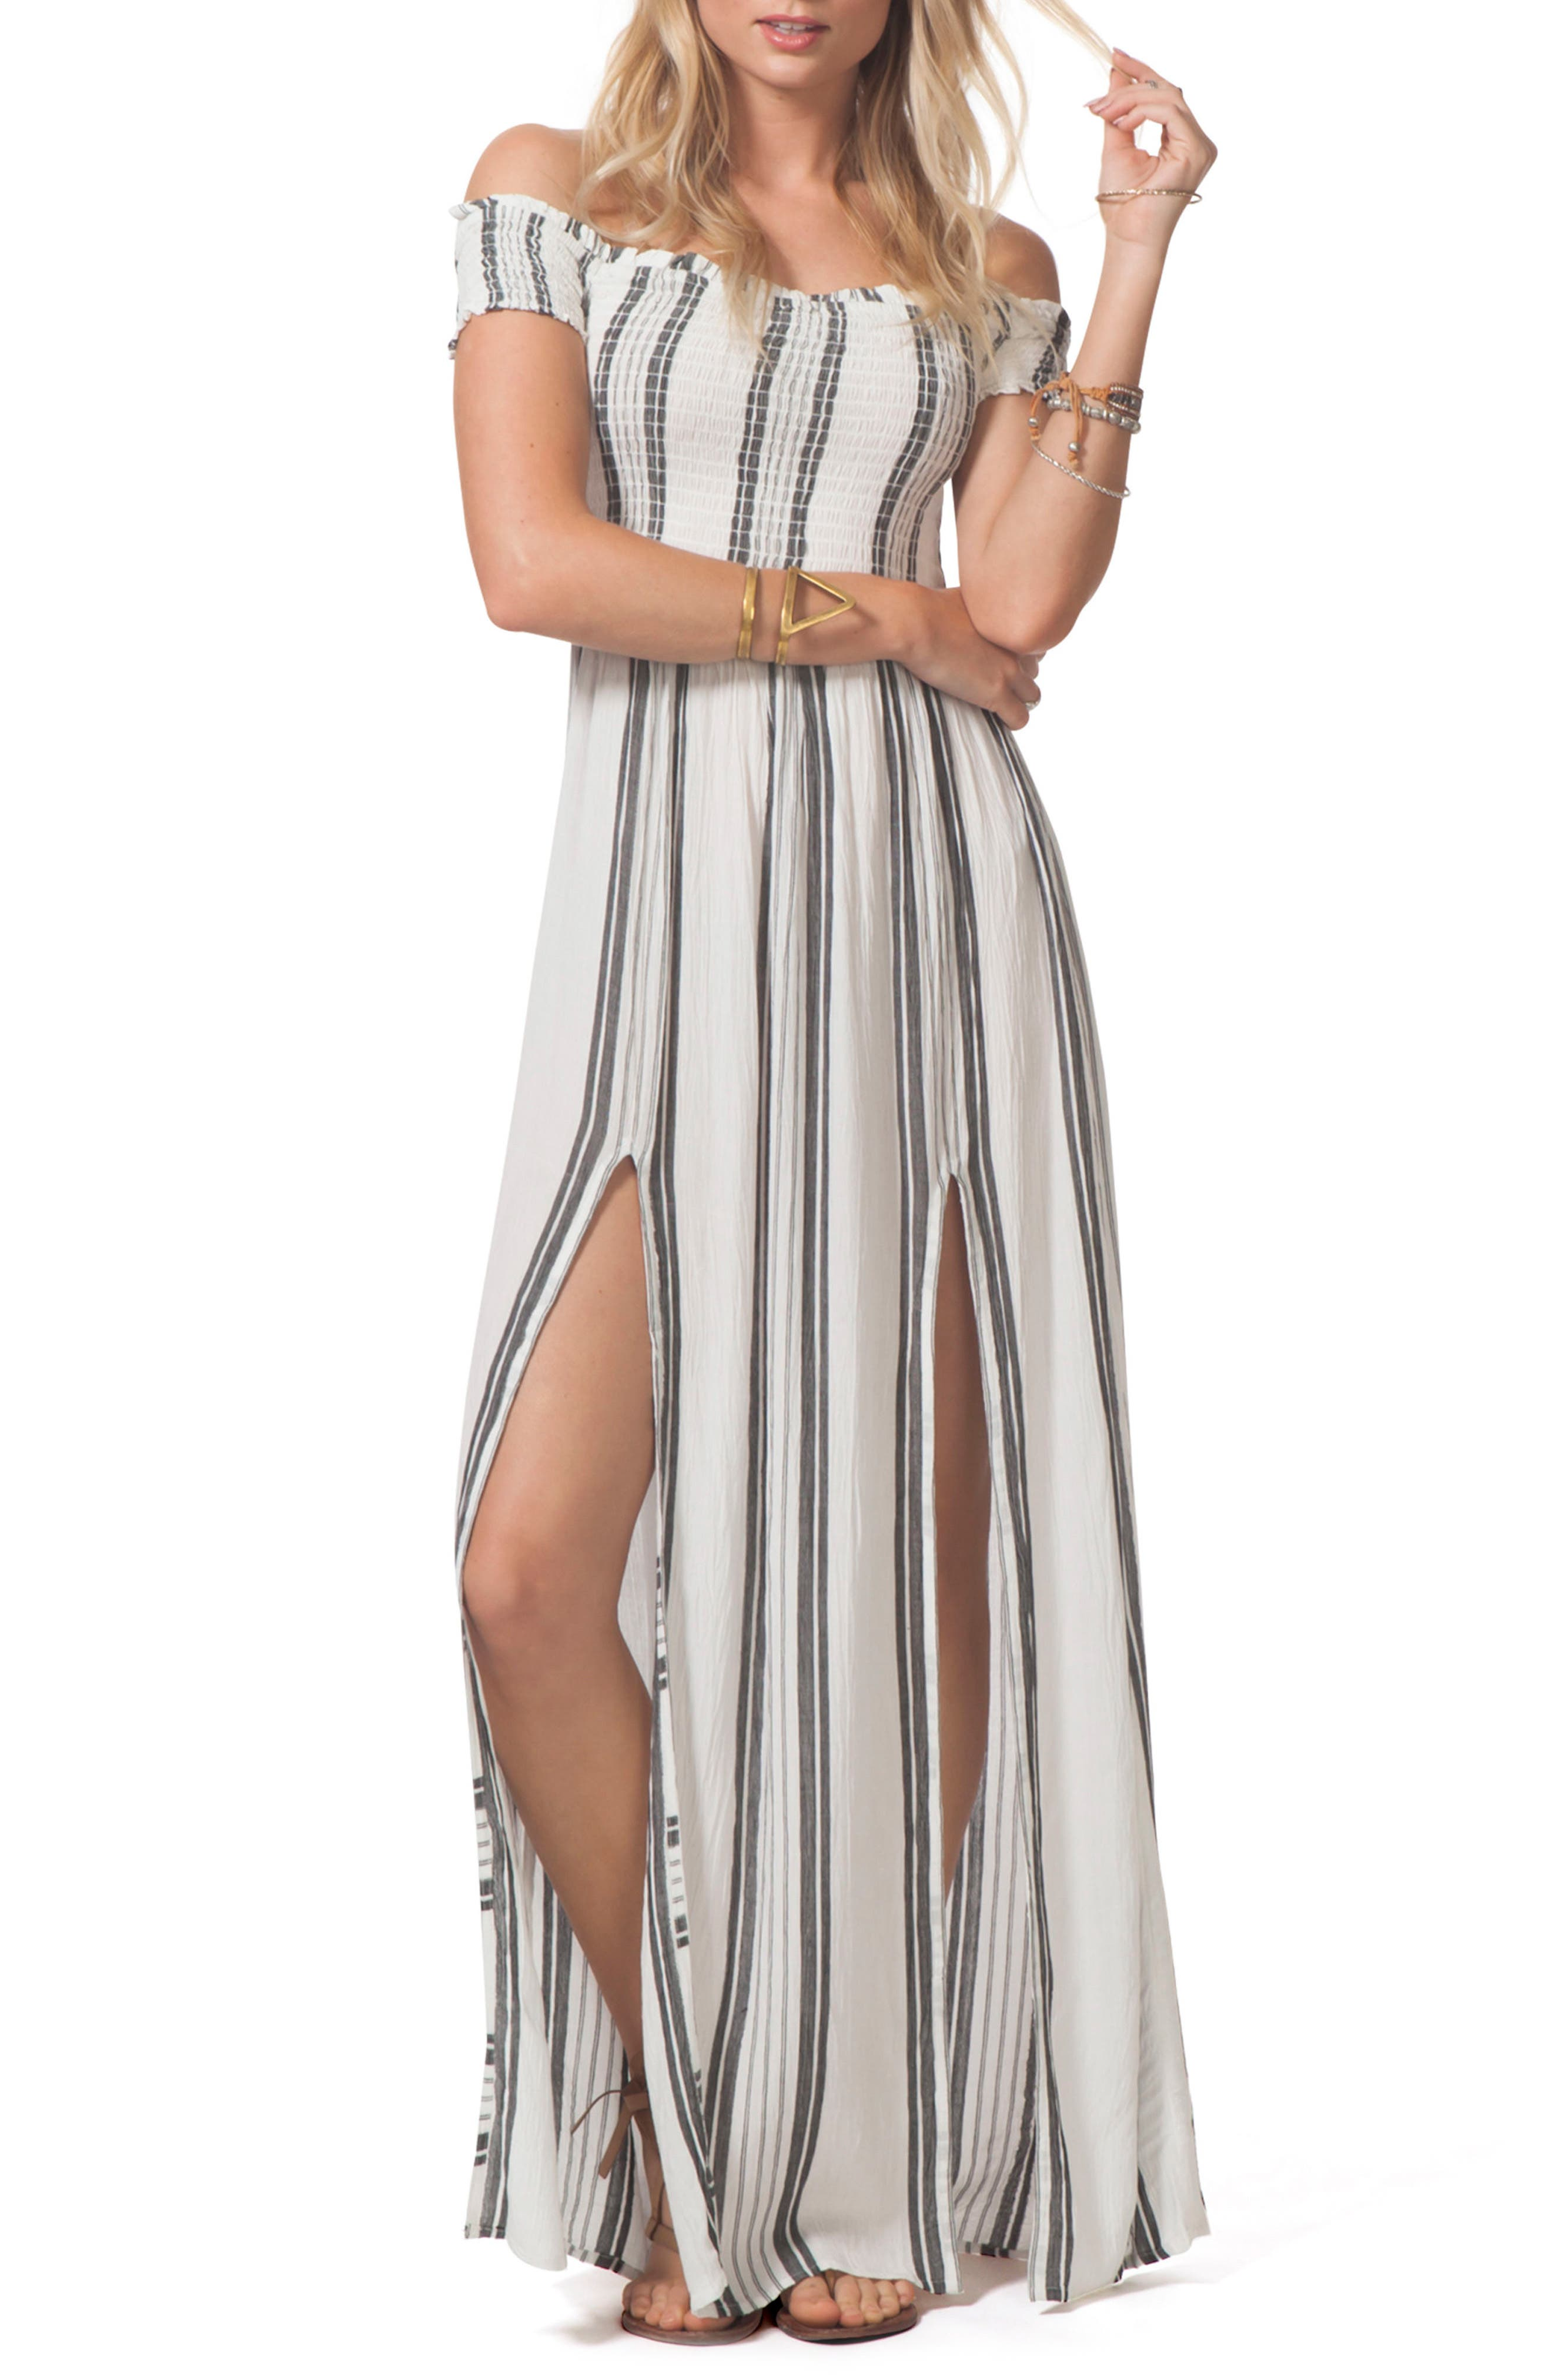 Rip Curl Soulmate Off the Shoulder Maxi Dress